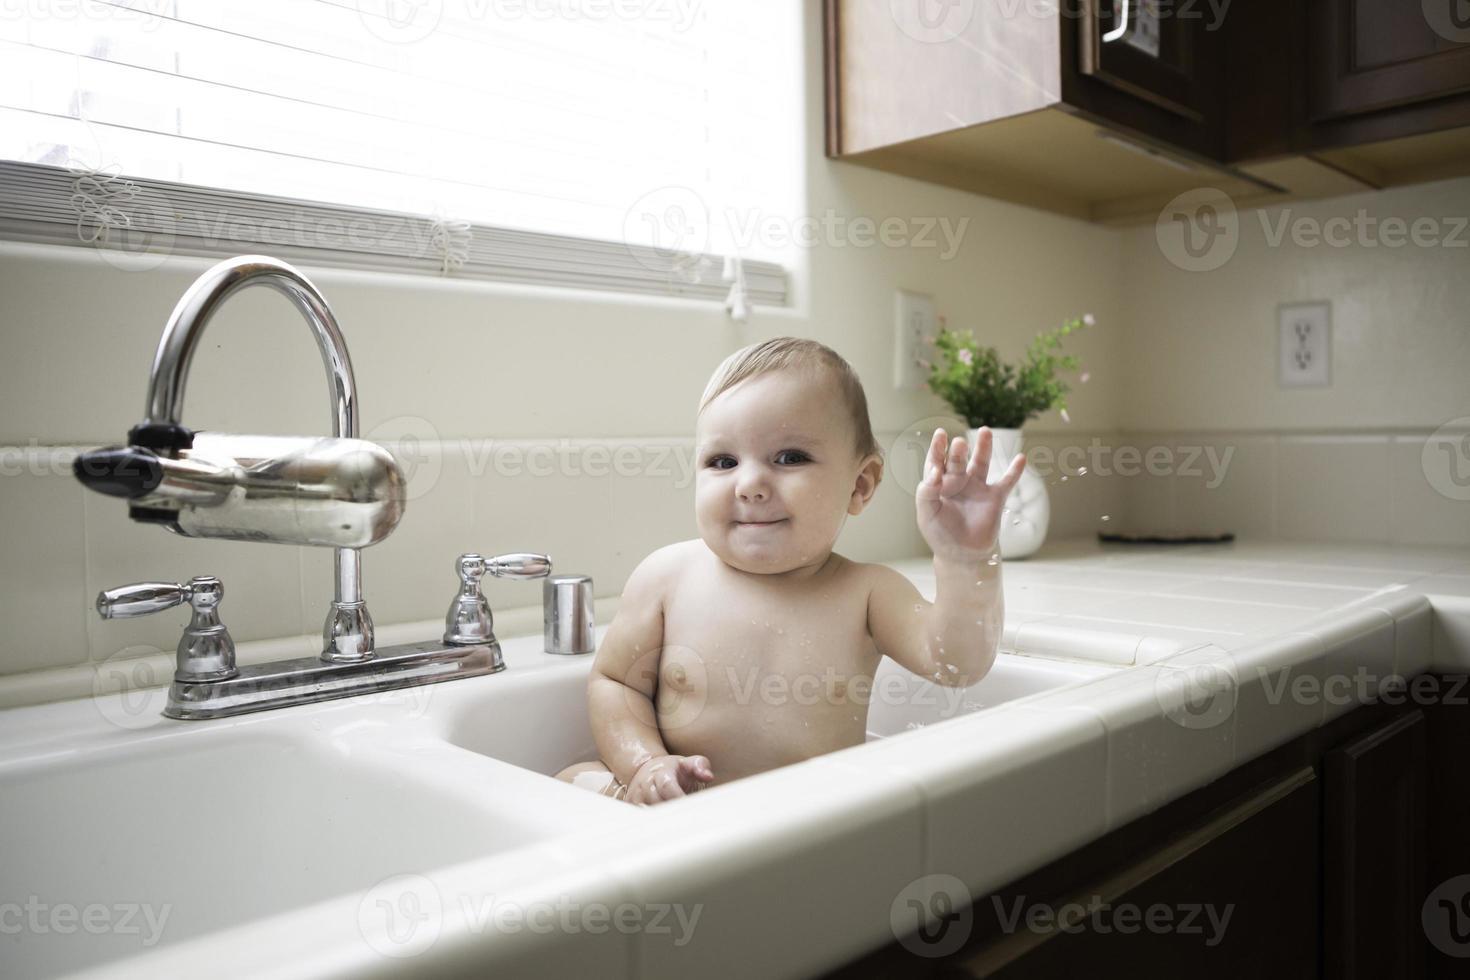 bambino nel lavandino foto